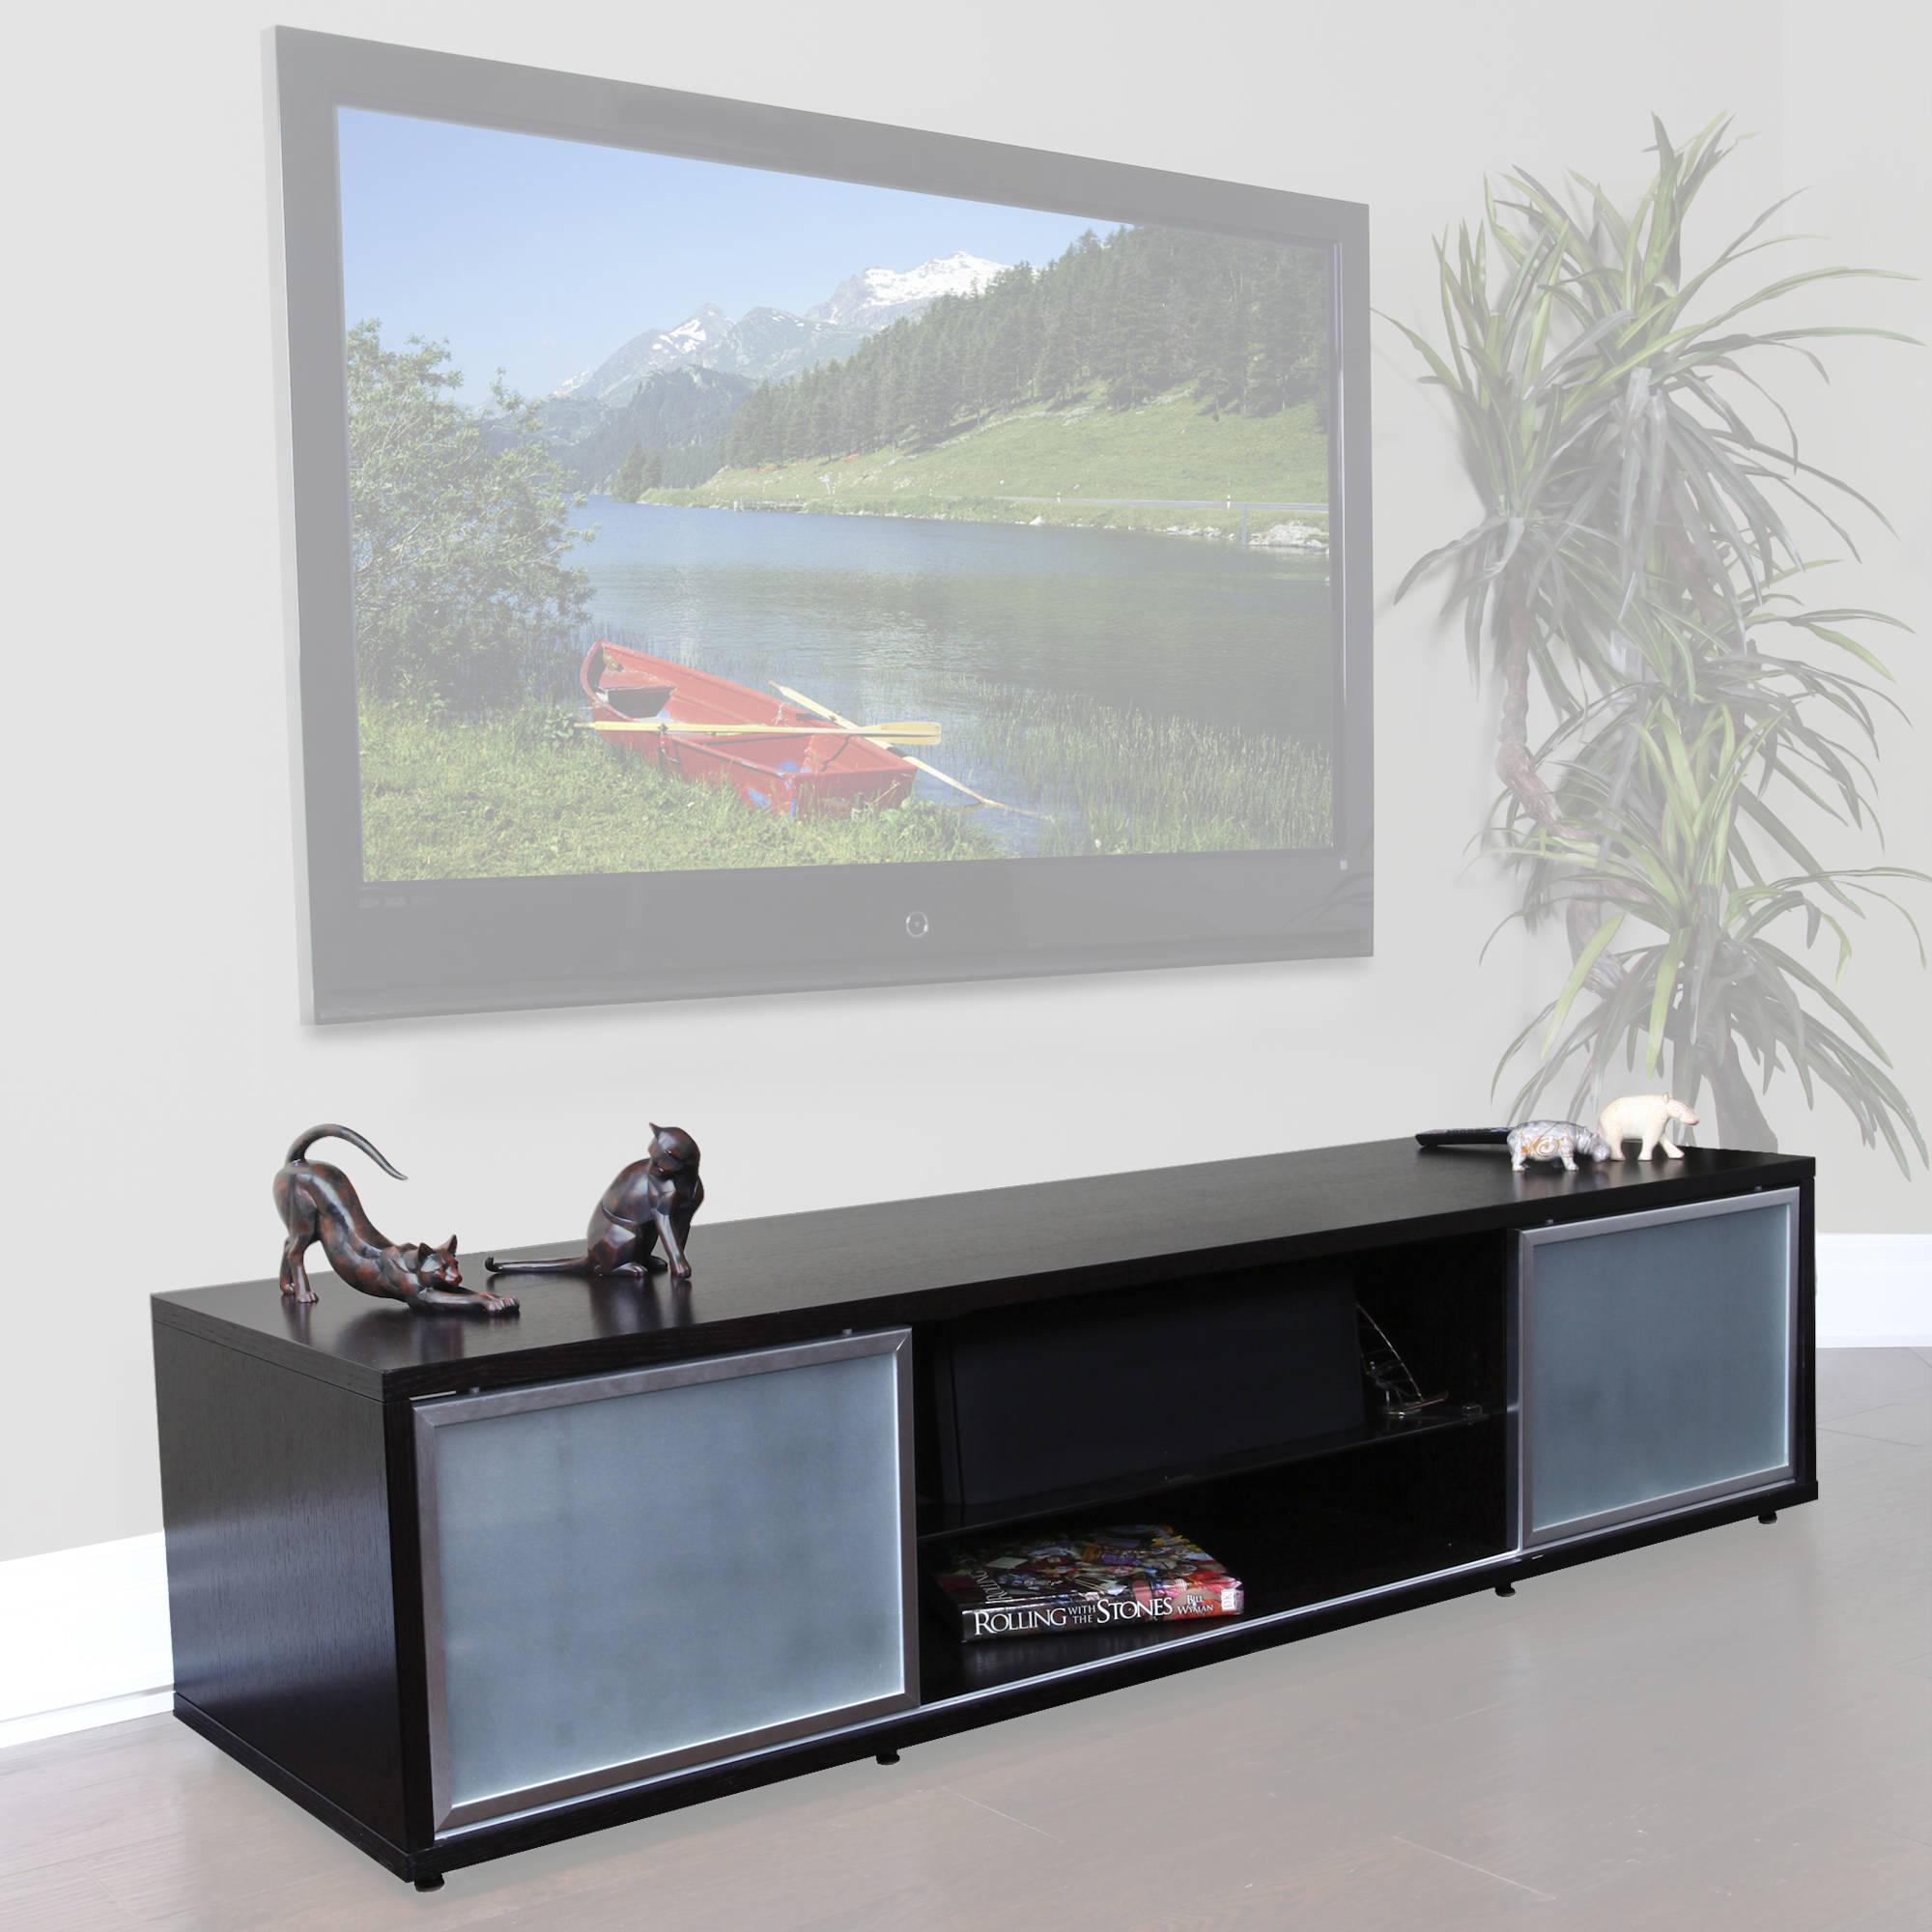 75 tv stand. PLATEAU SR-V 75 TV Stand (Espresso Finish, Silver Door Frames) Tv